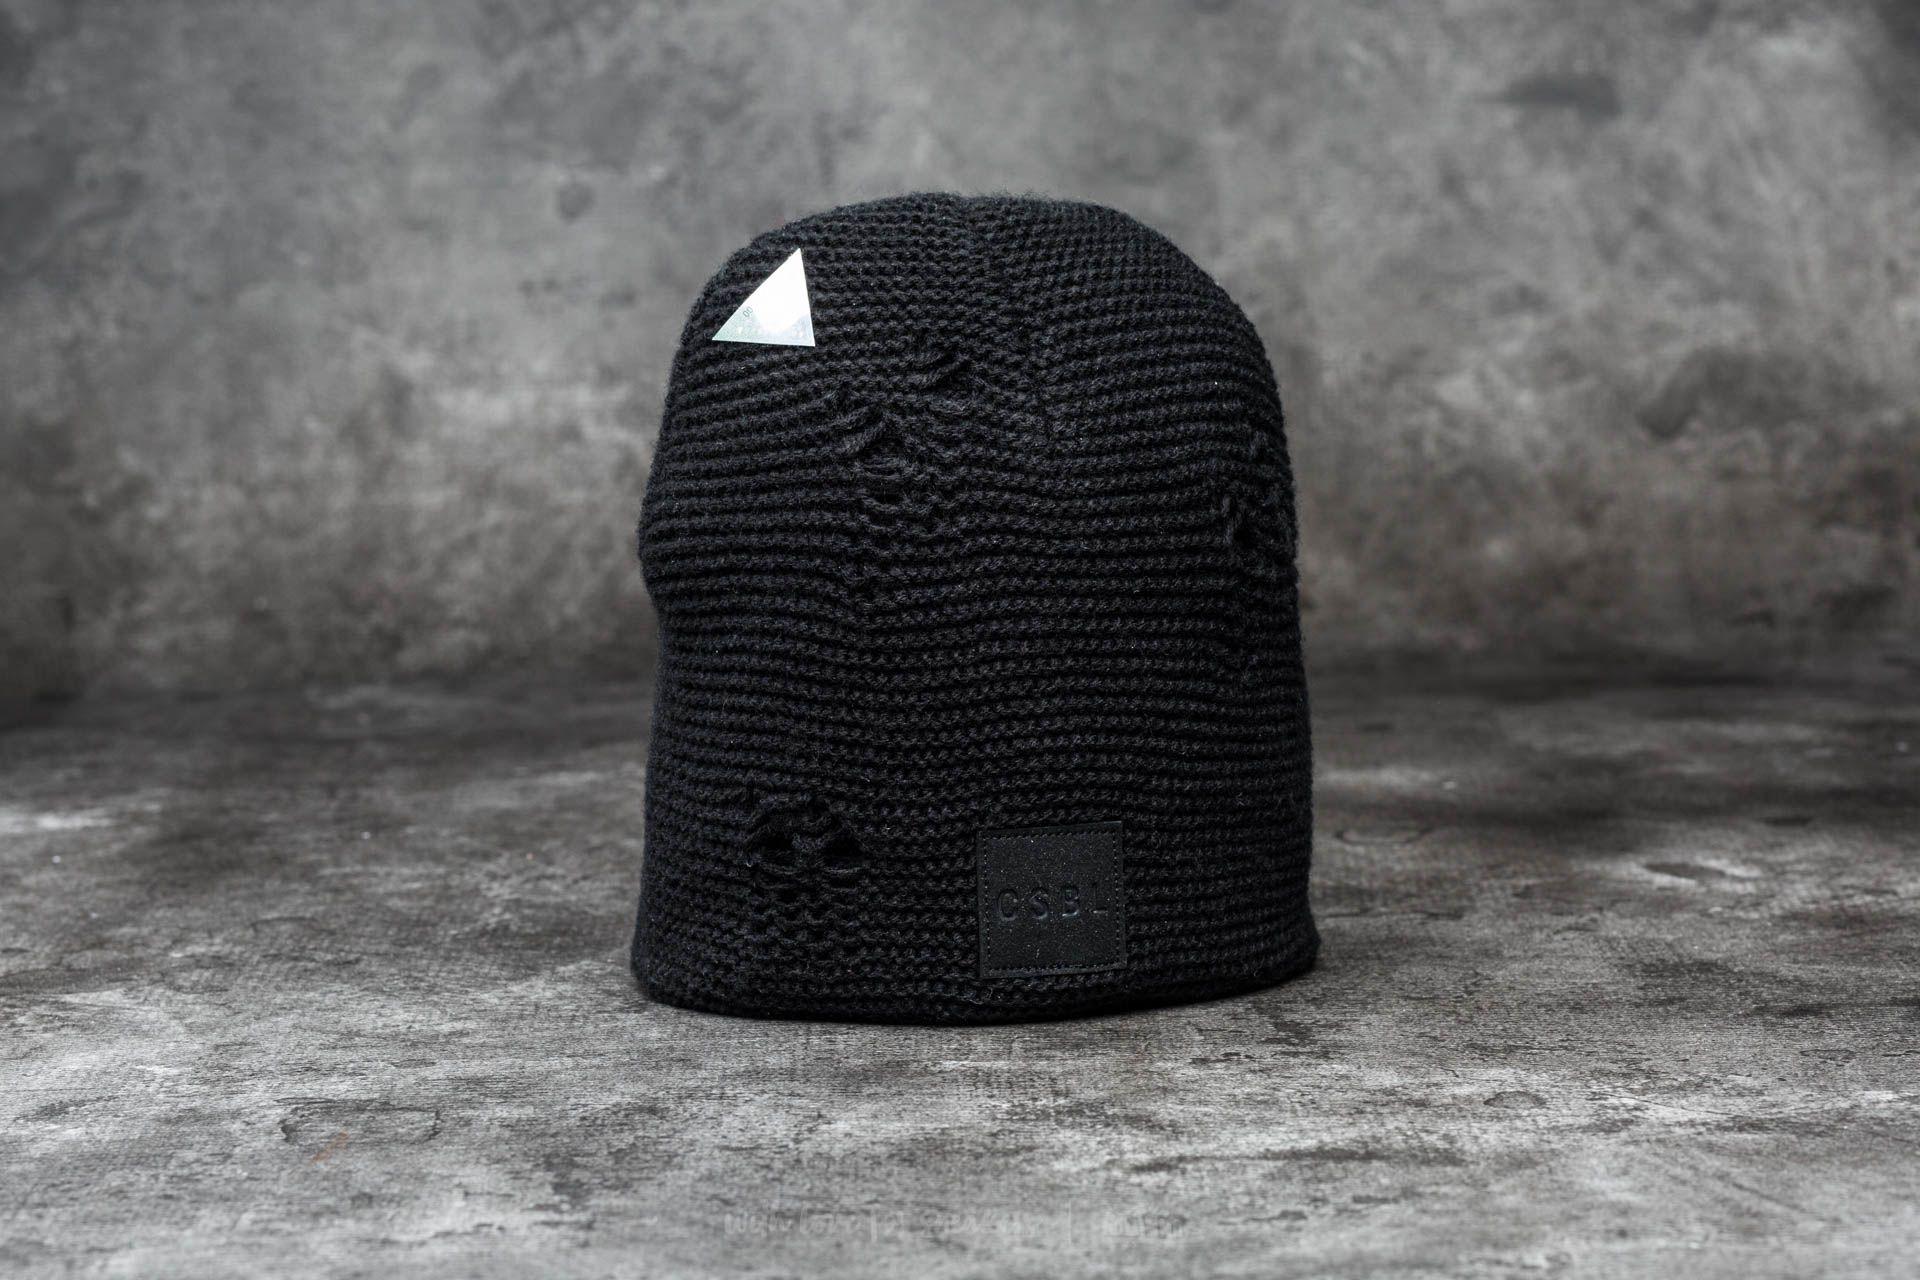 Cayler & Sons CSBL Operator Beanie Black Knit/ Black - 12505